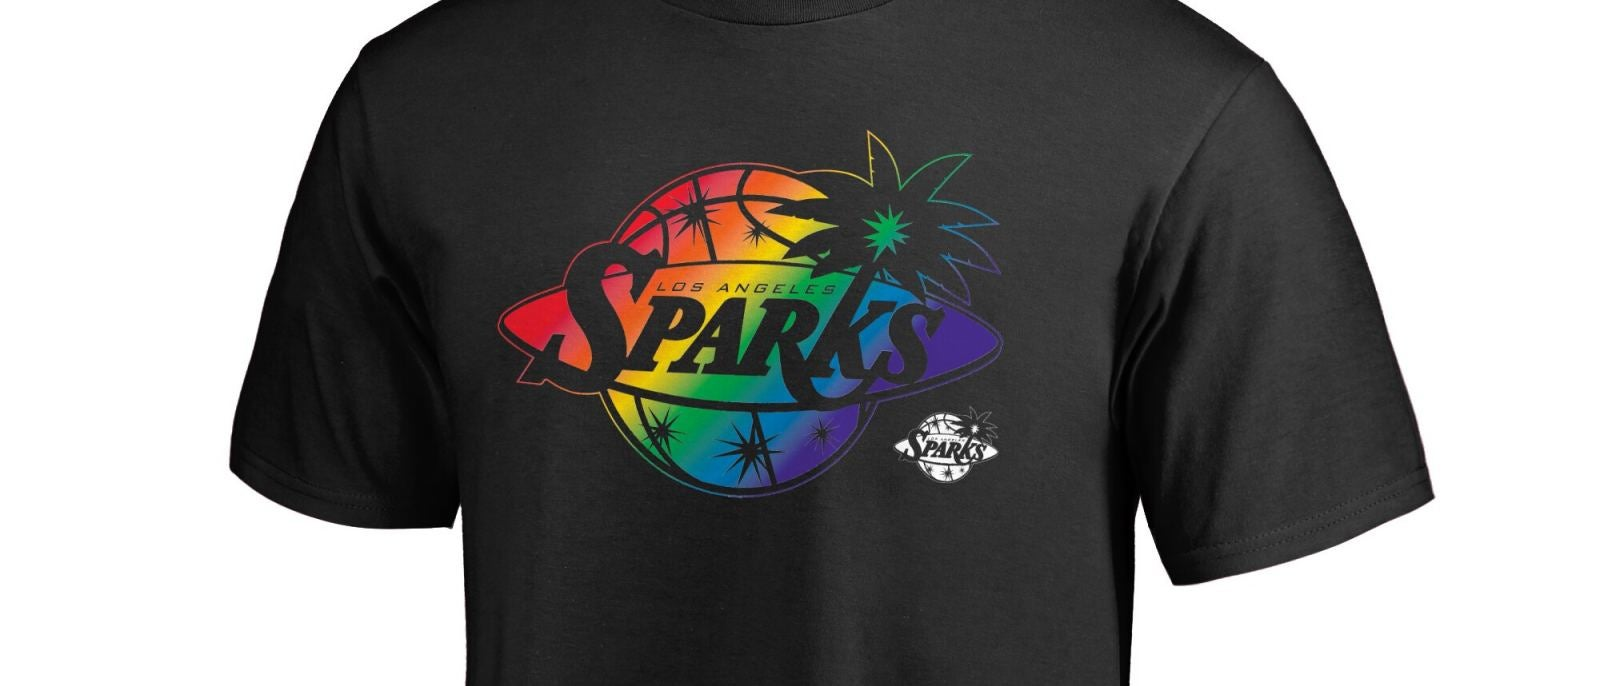 Los Angeles Sparks WNBA Pride T-shirt